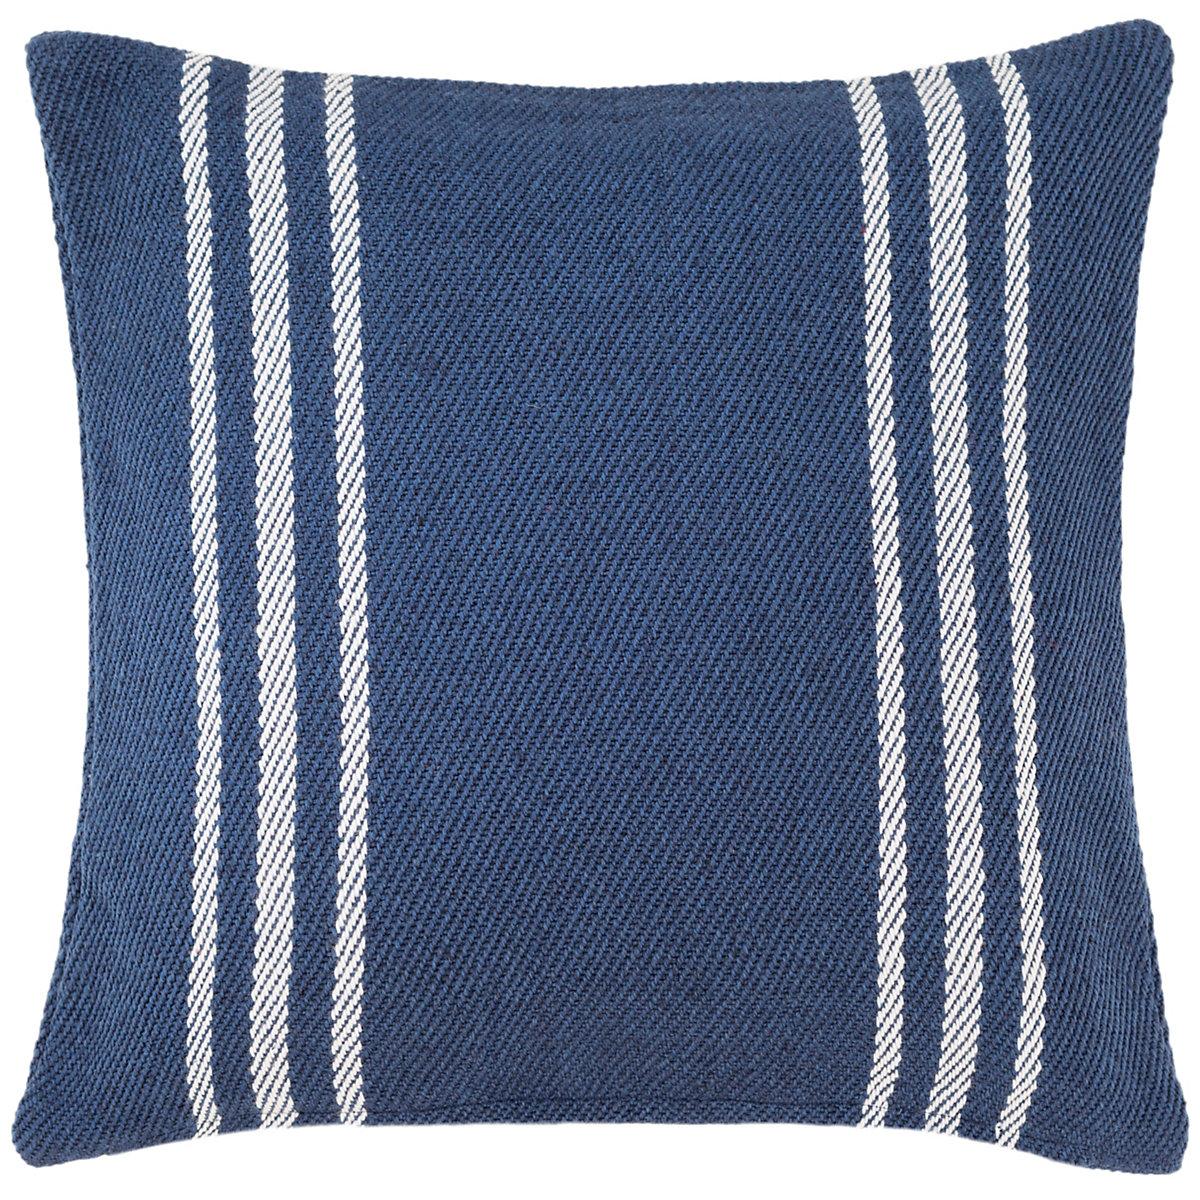 Cape Stripe Navywhite Indooroutdoor Pillow Fresh American